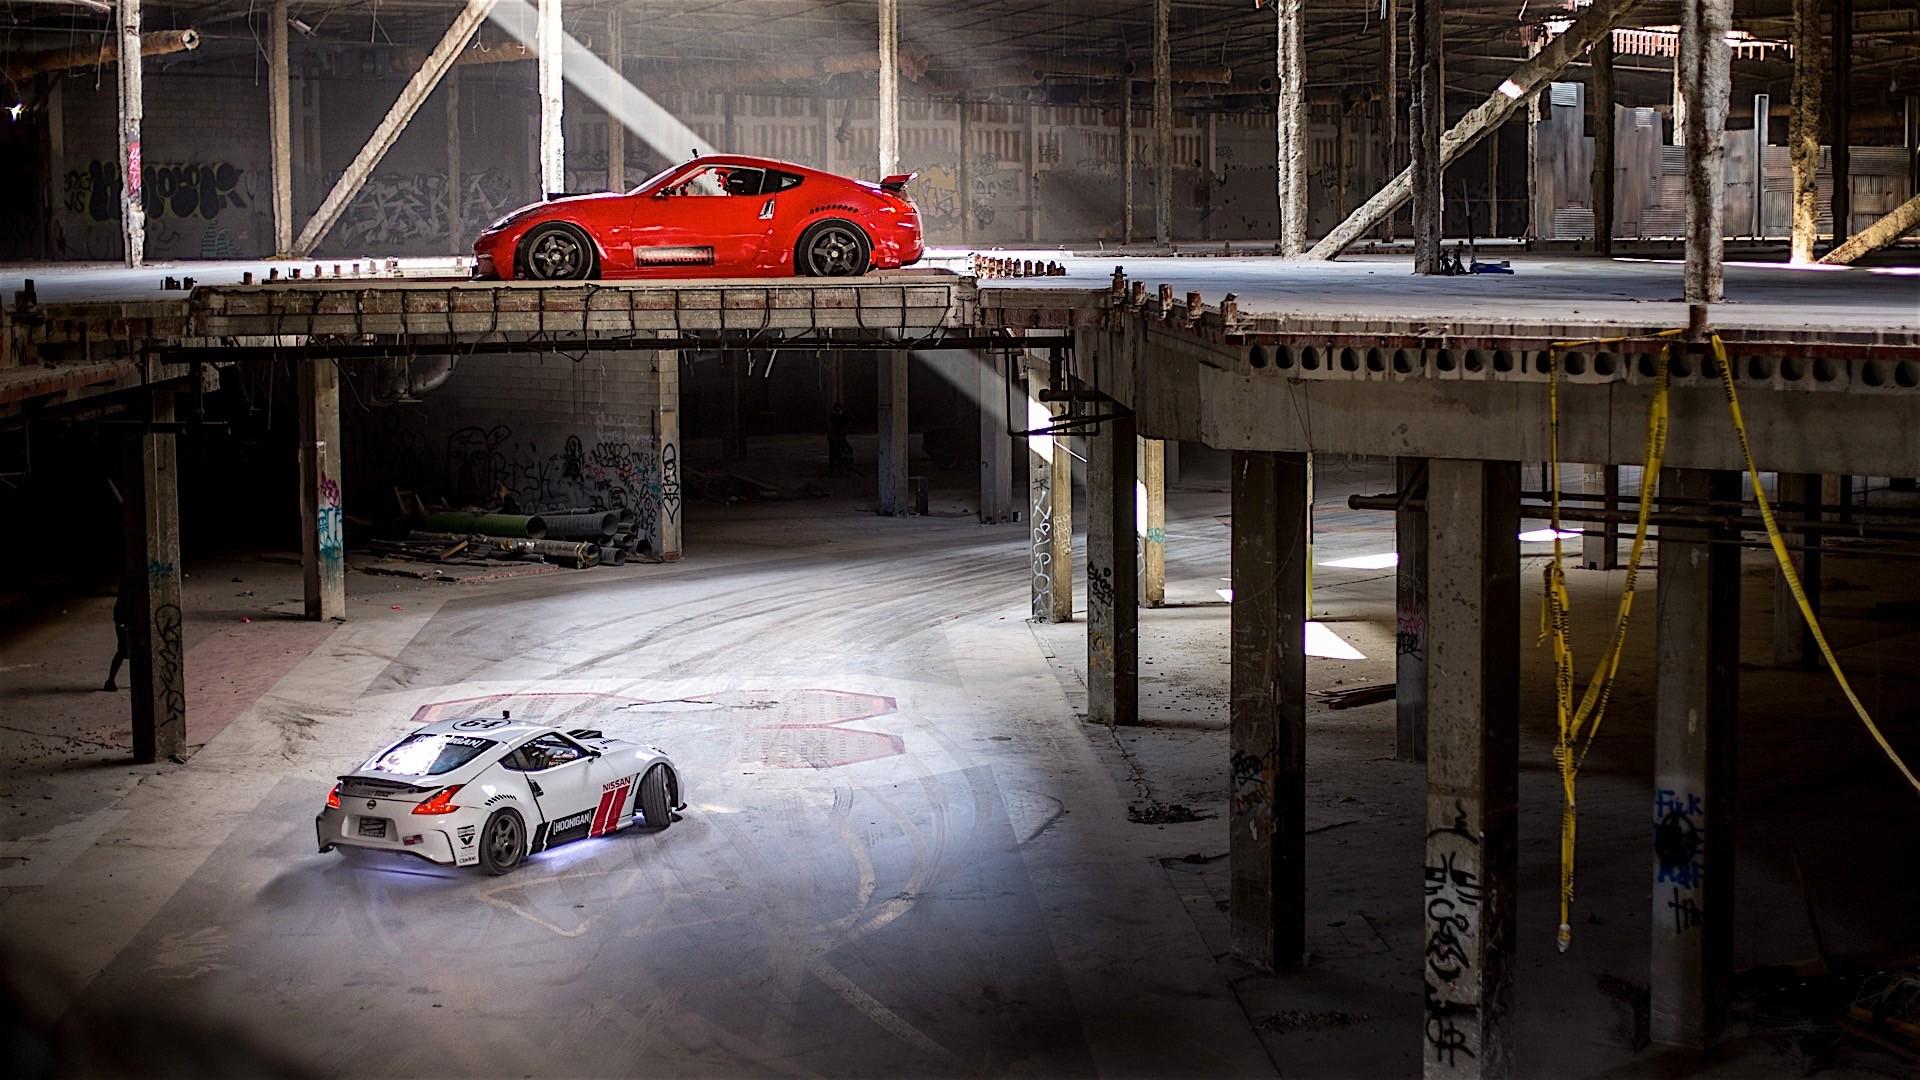 Ken Block Cars Wallpaper Nissan And Hoonigan S Black Friday Has Two 1 000 Hp Cars